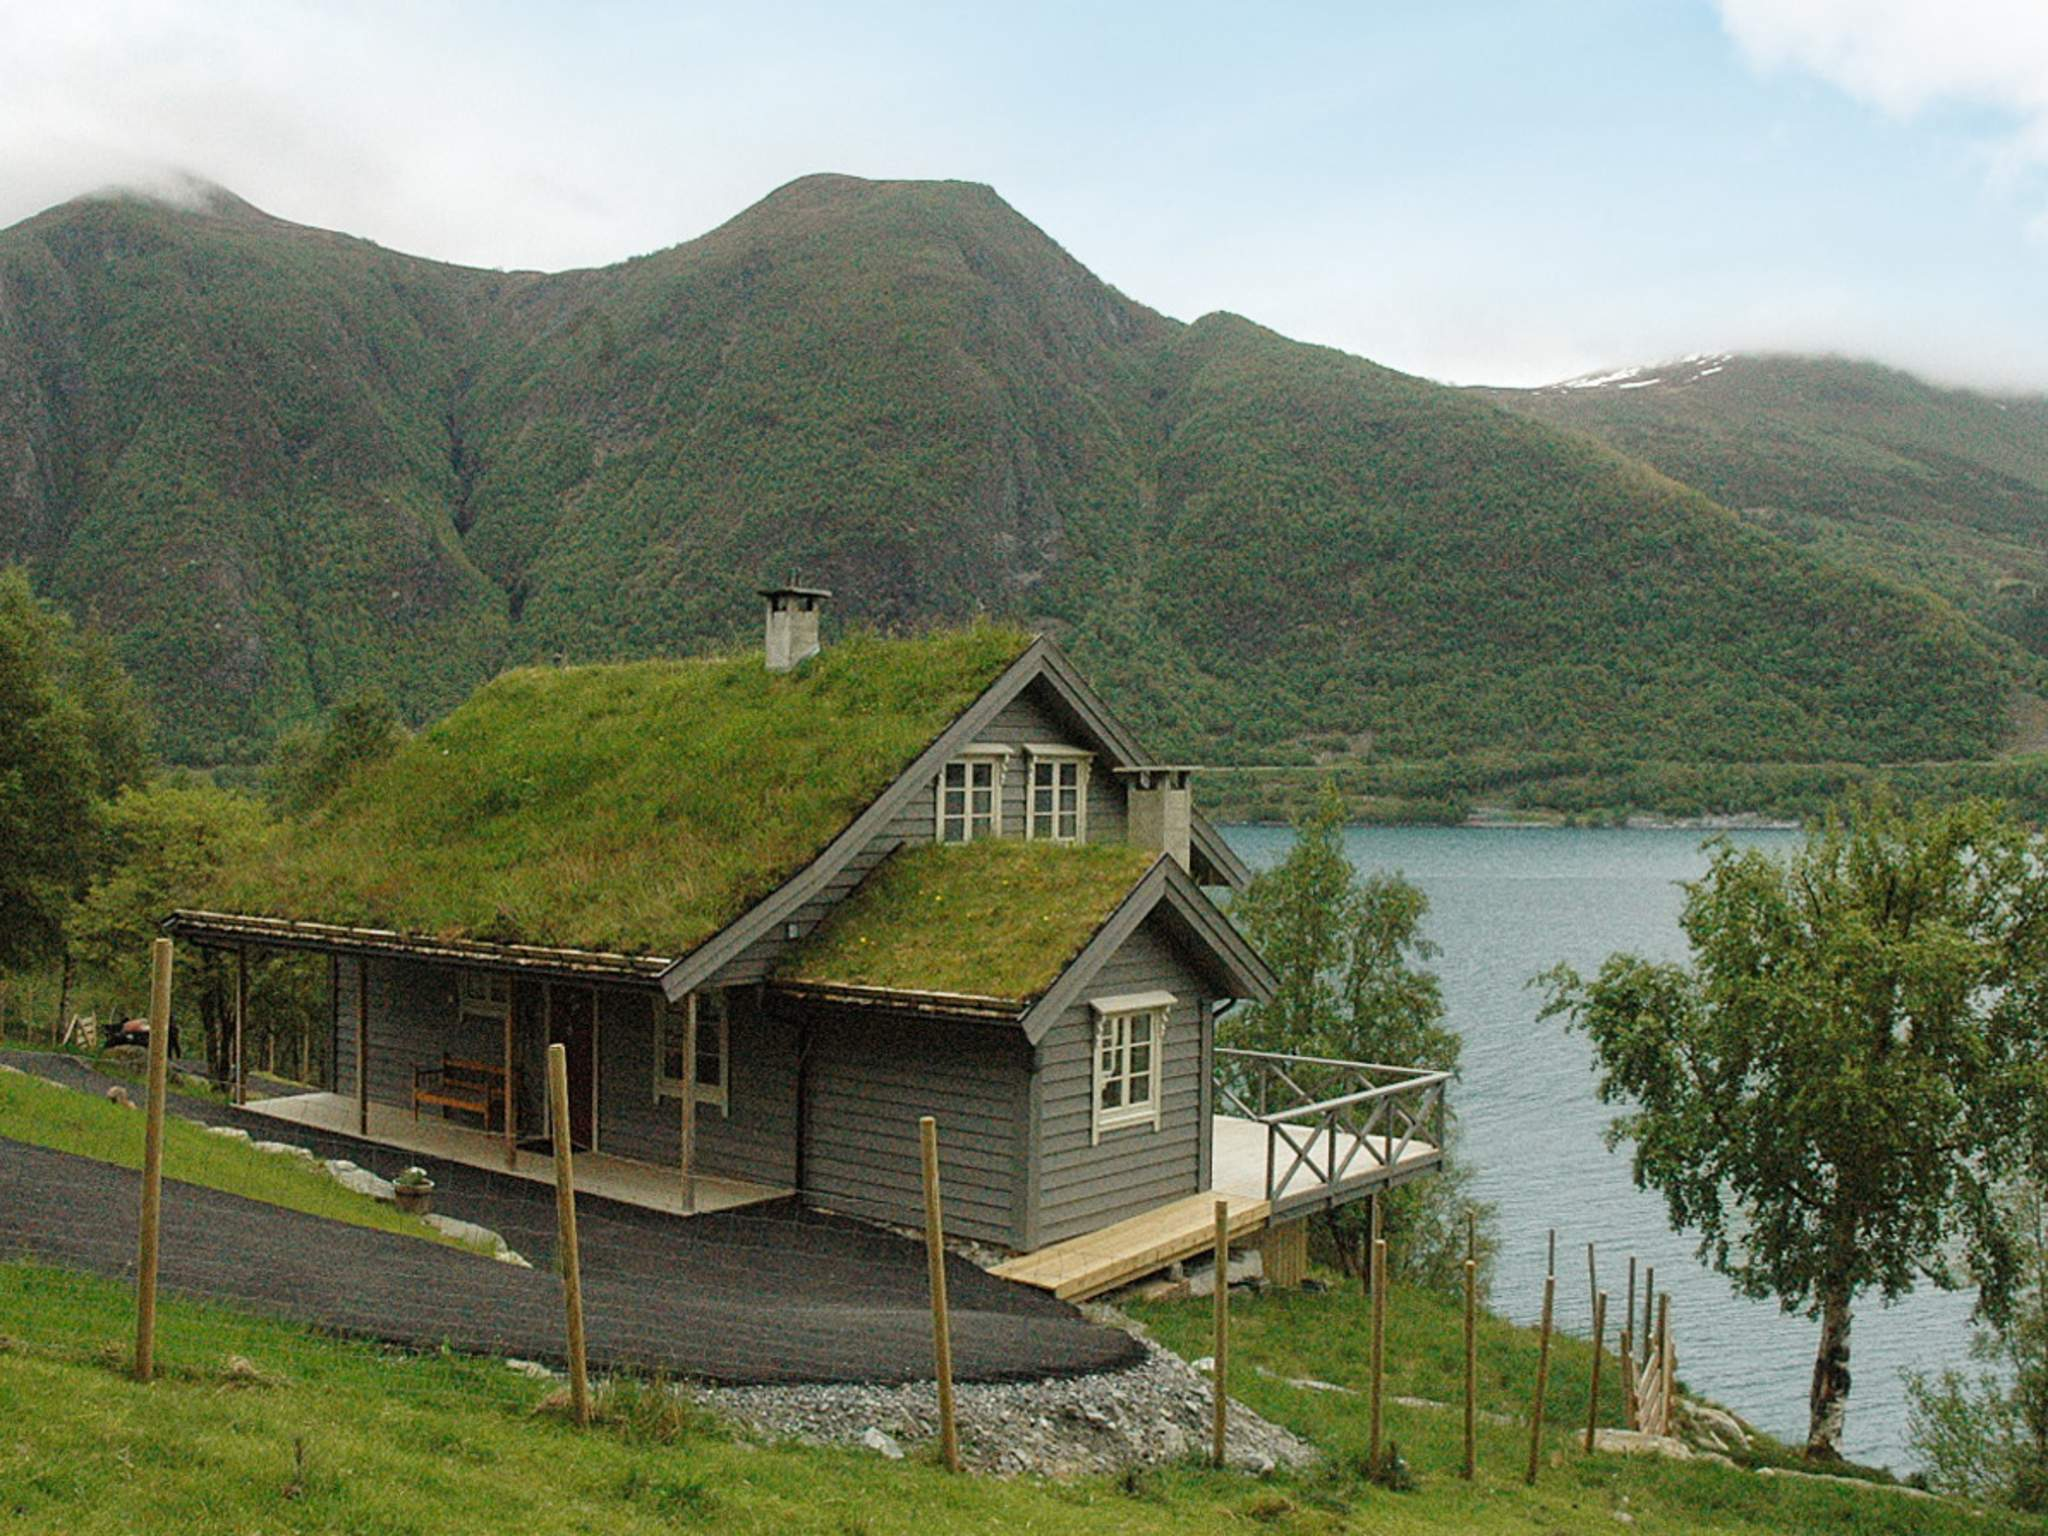 Ferienhaus Innselsetbygda (1043168), Lauvstad, More - Romsdal, Westnorwegen, Norwegen, Bild 30